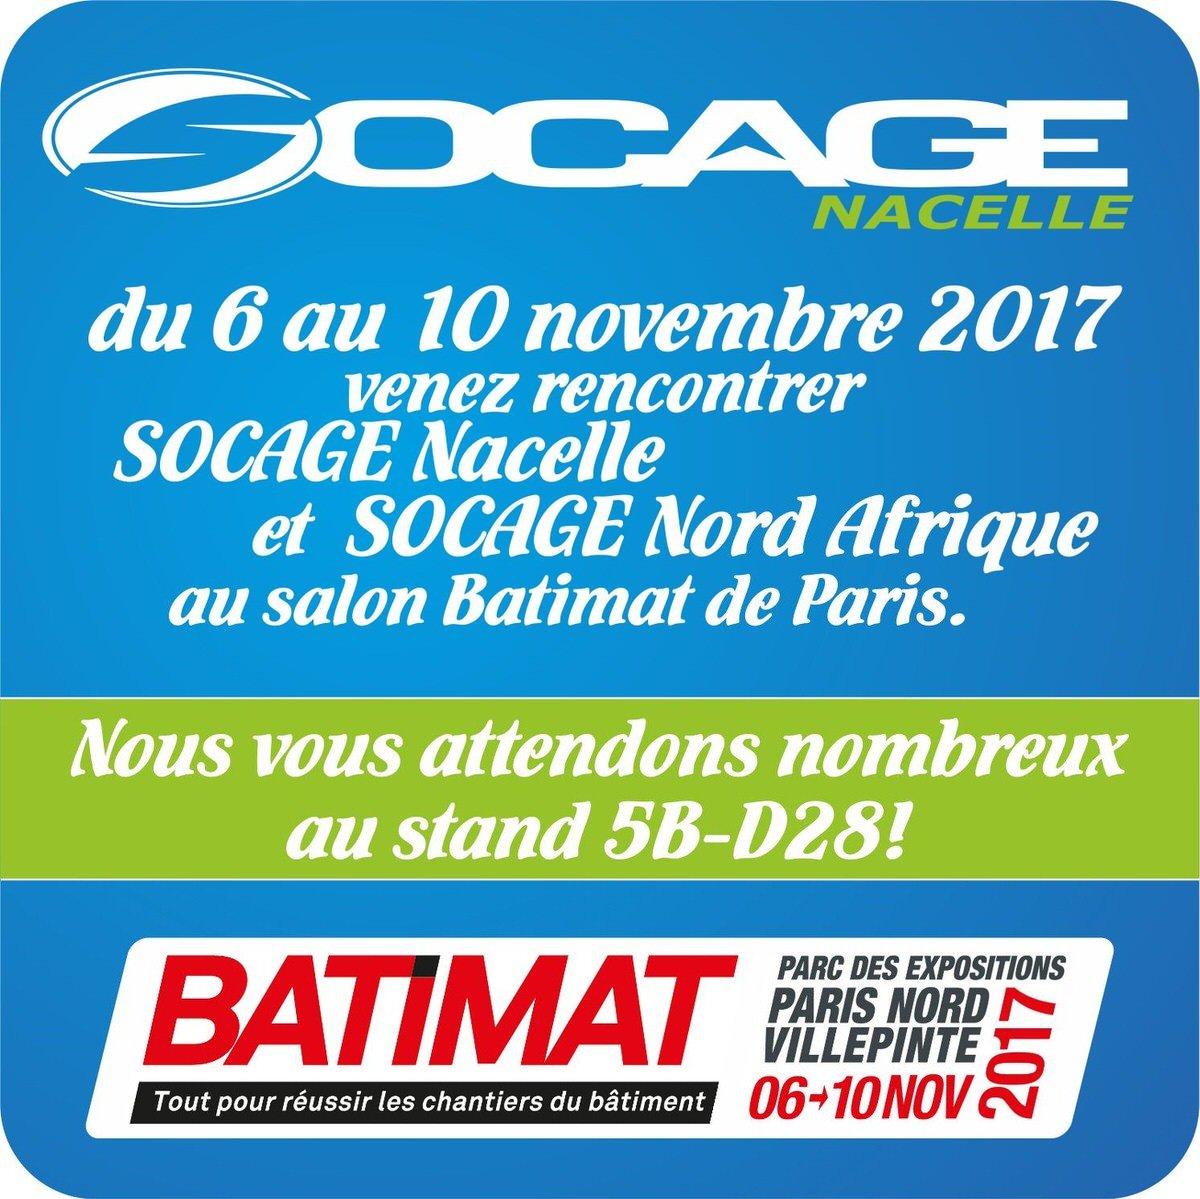 socage nacelle e nord afrique batimat banner articolo 1 13